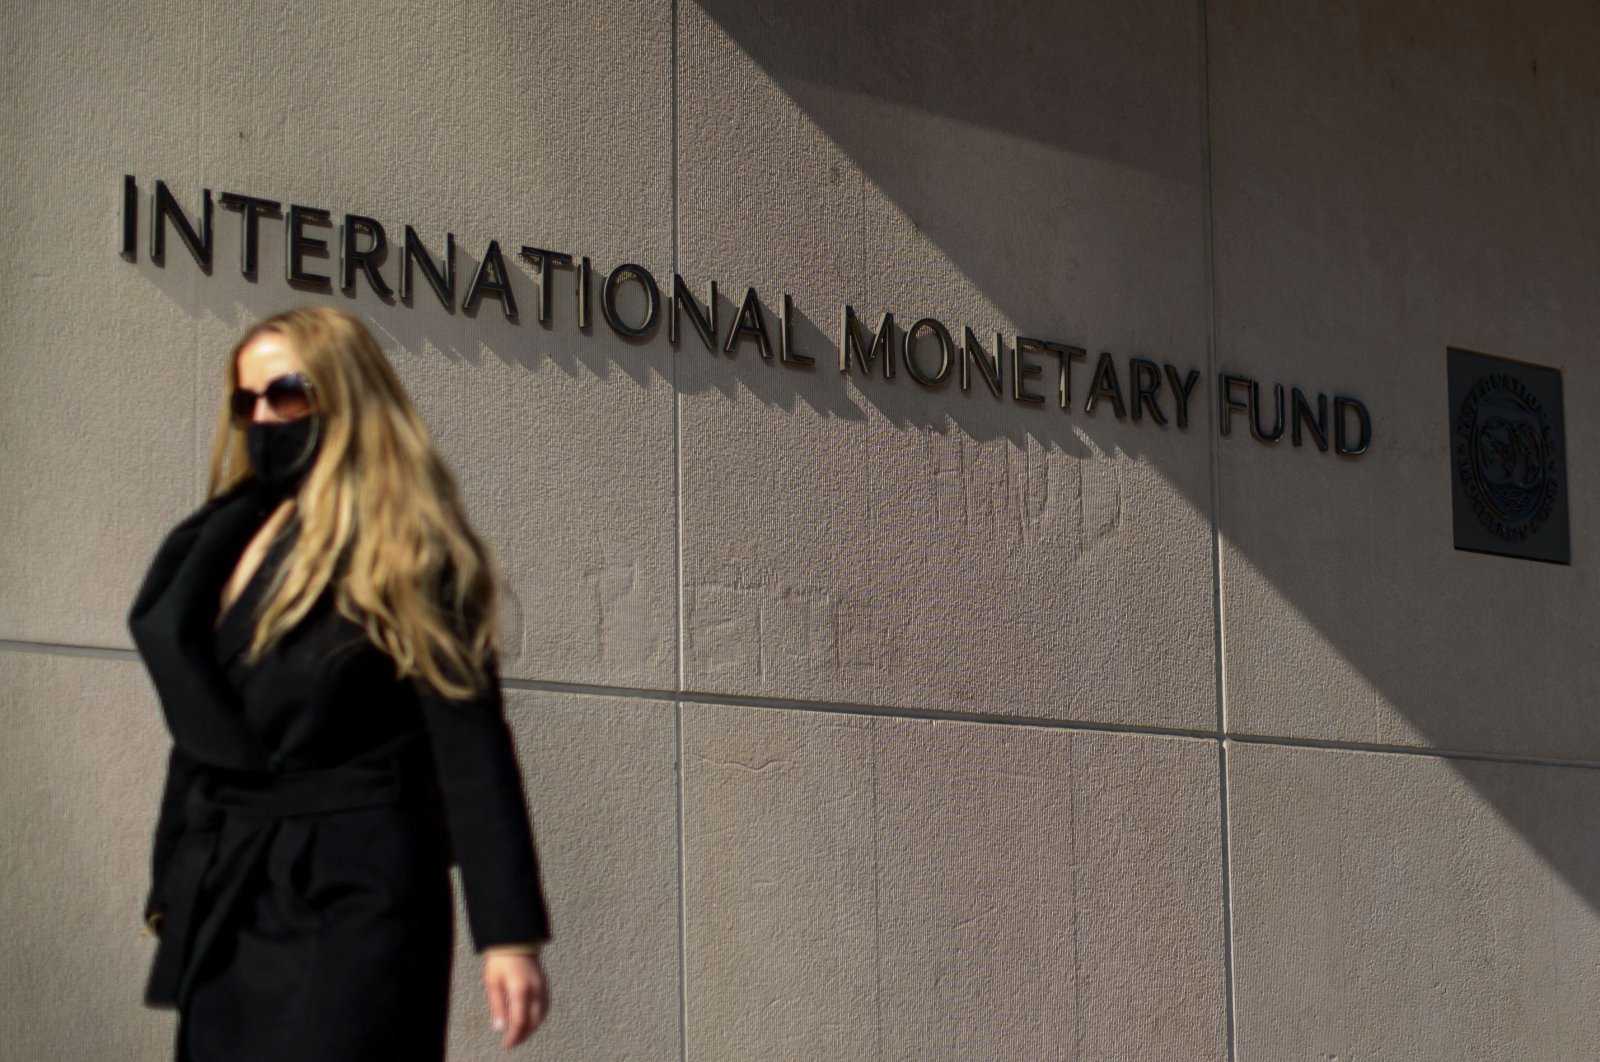 A woman walks past the International Monetary Fund (IMF) headquarters building in Washington, D.C., U.S., April 5, 2021. (AFP Photo)